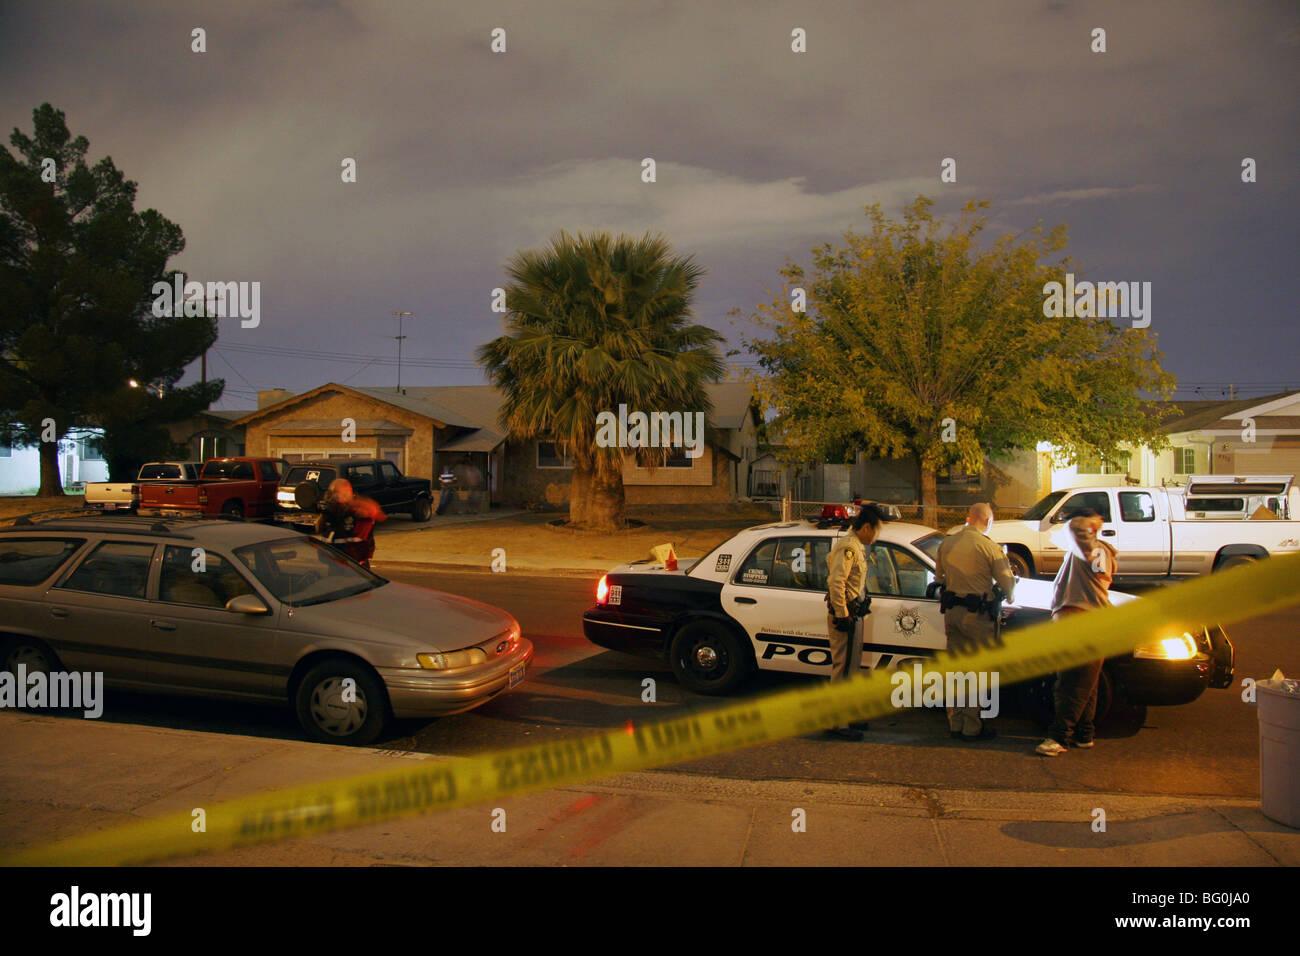 Las Vegas police and CSI at a crime scene late at night, Las Vegas, Nevada, USA. - Stock Image